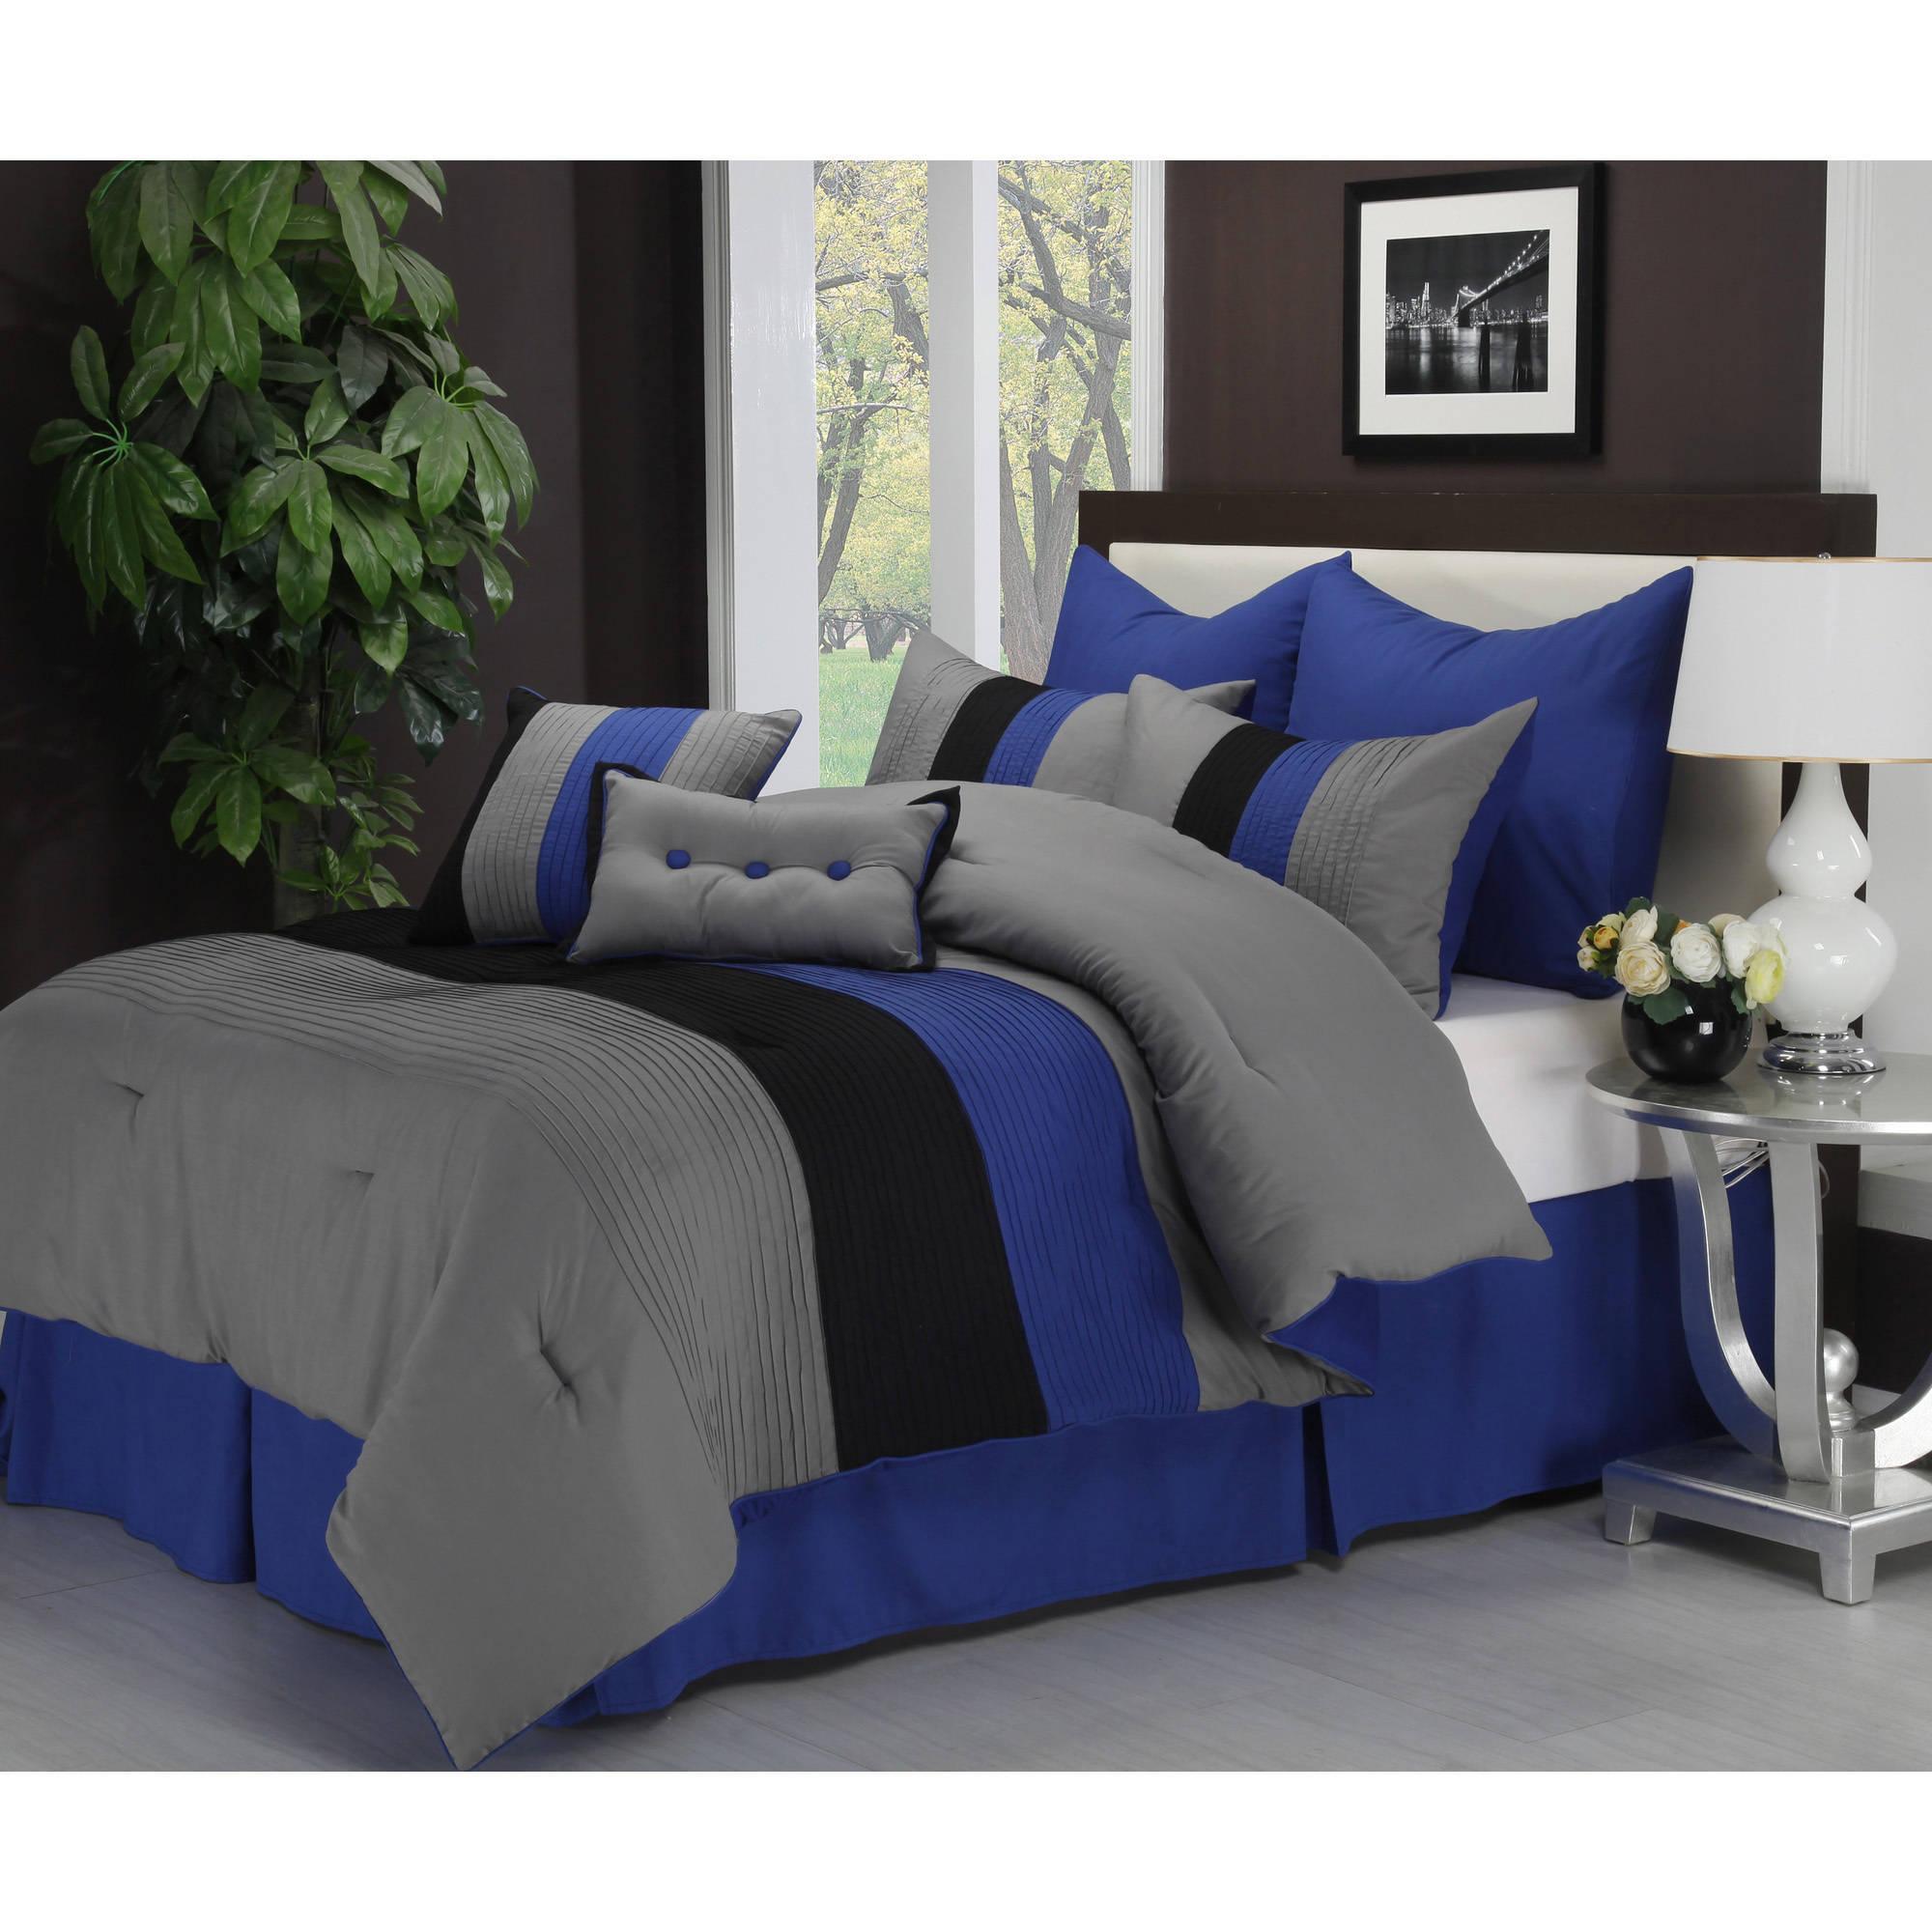 Superior Florence Textured 8-Piece Comforter set